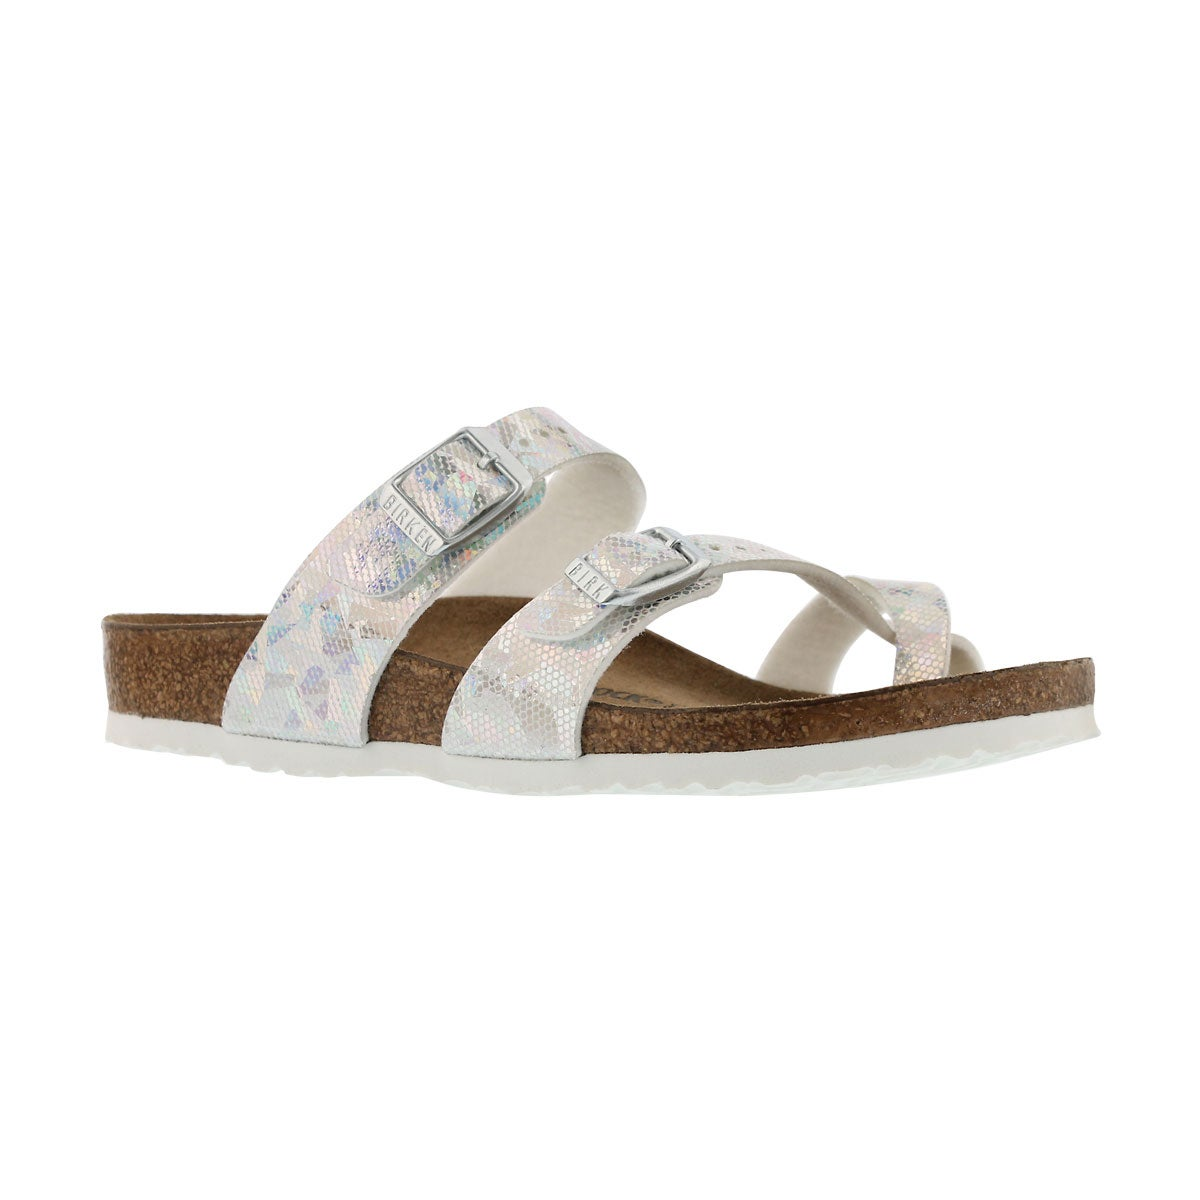 Grls Mayari BF hologram silver sandal